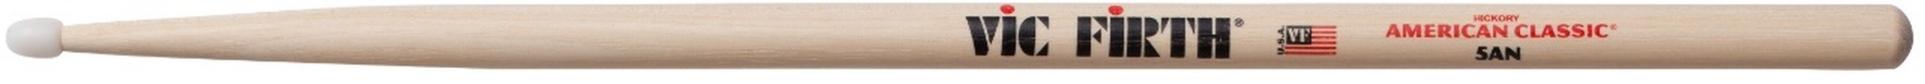 Extreme 5A Nylon Drumsticks: Drumsticks